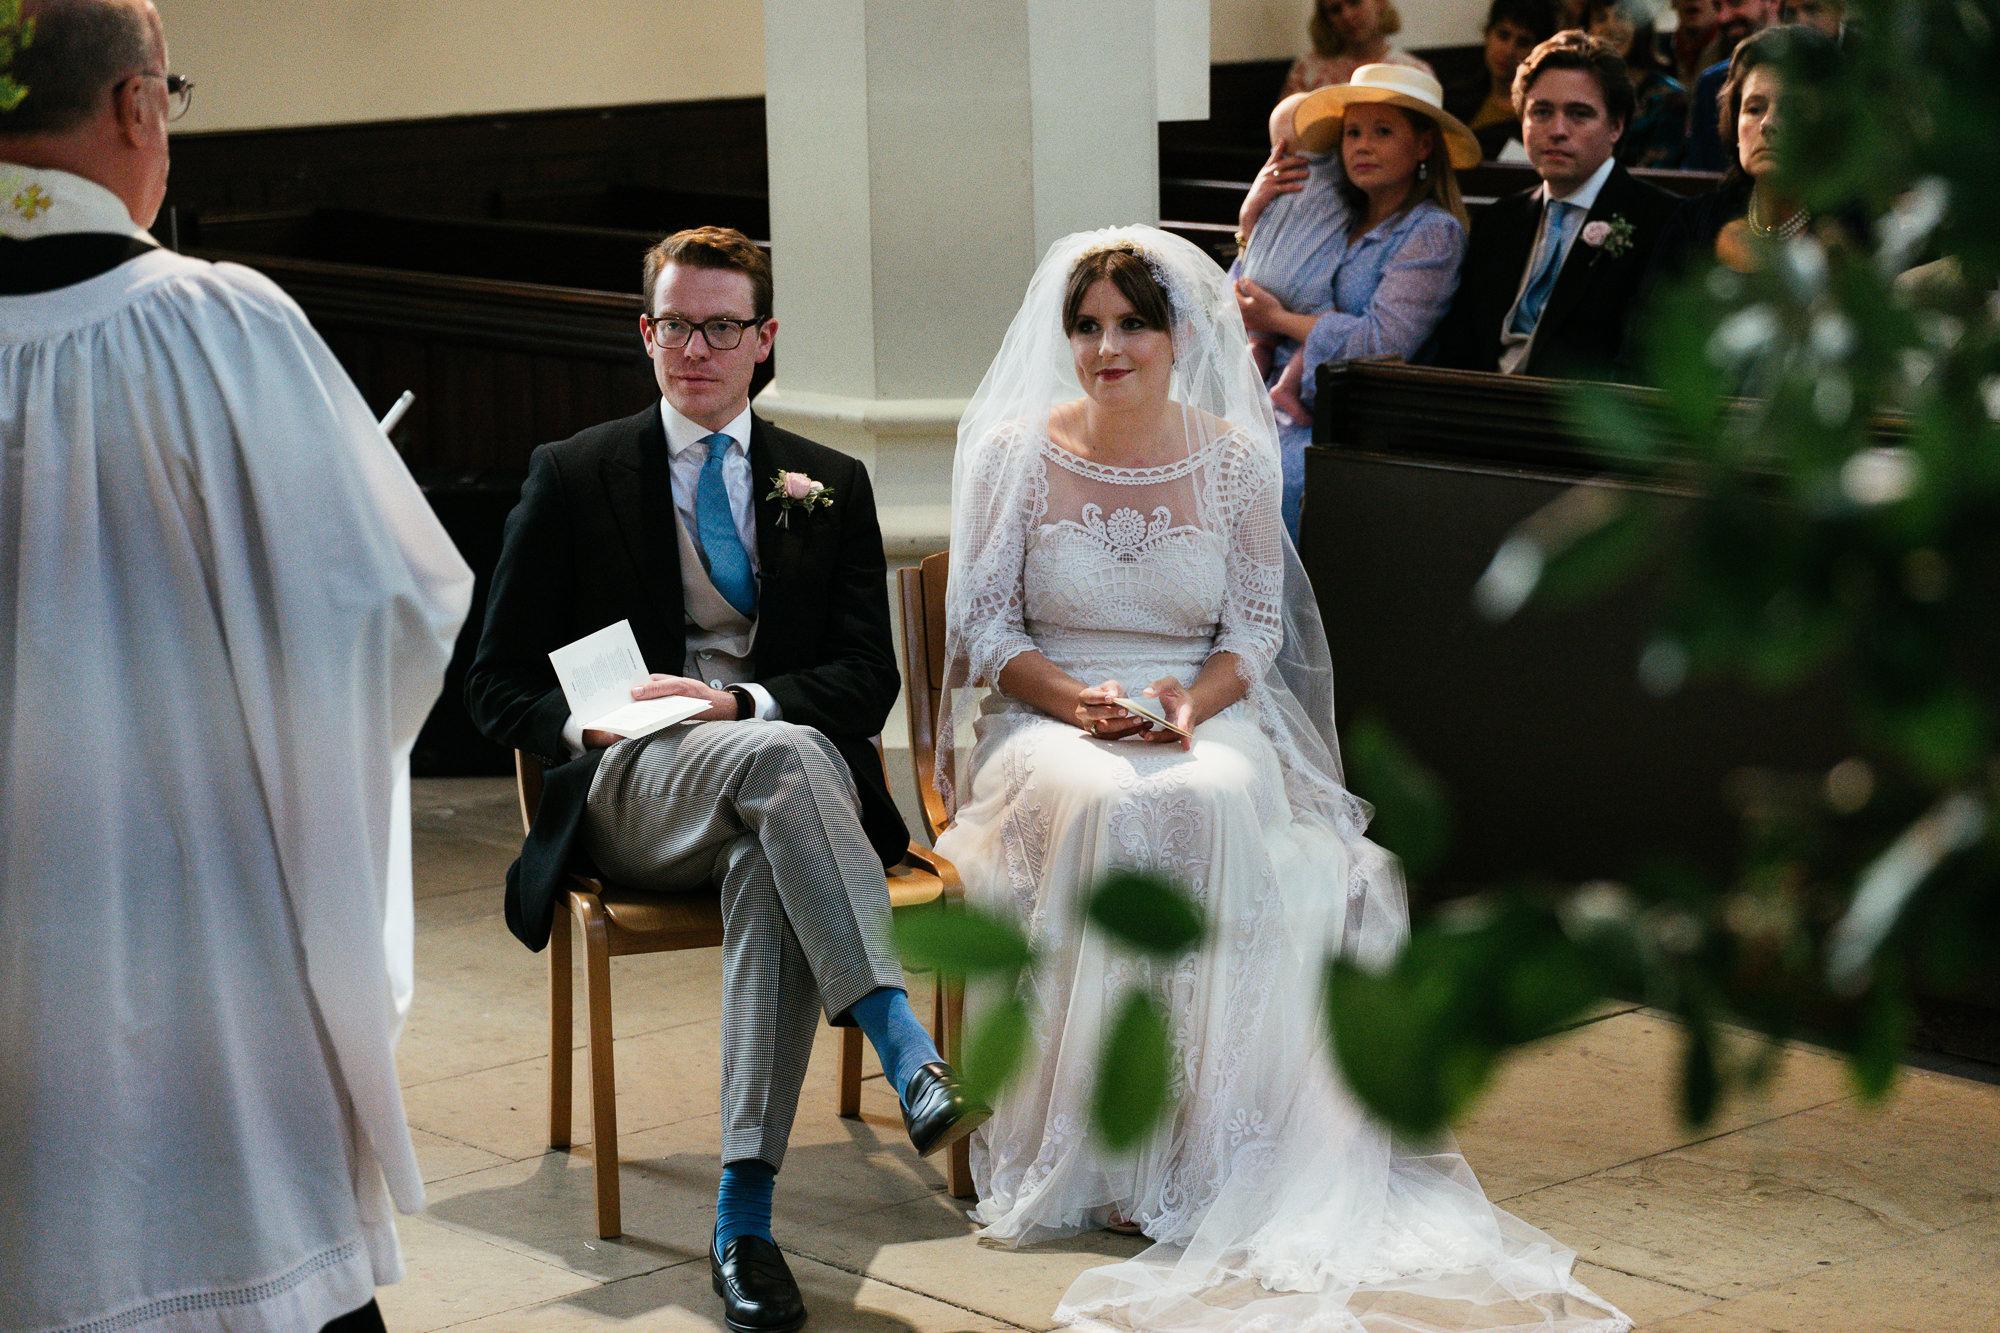 St Michael's church wedding